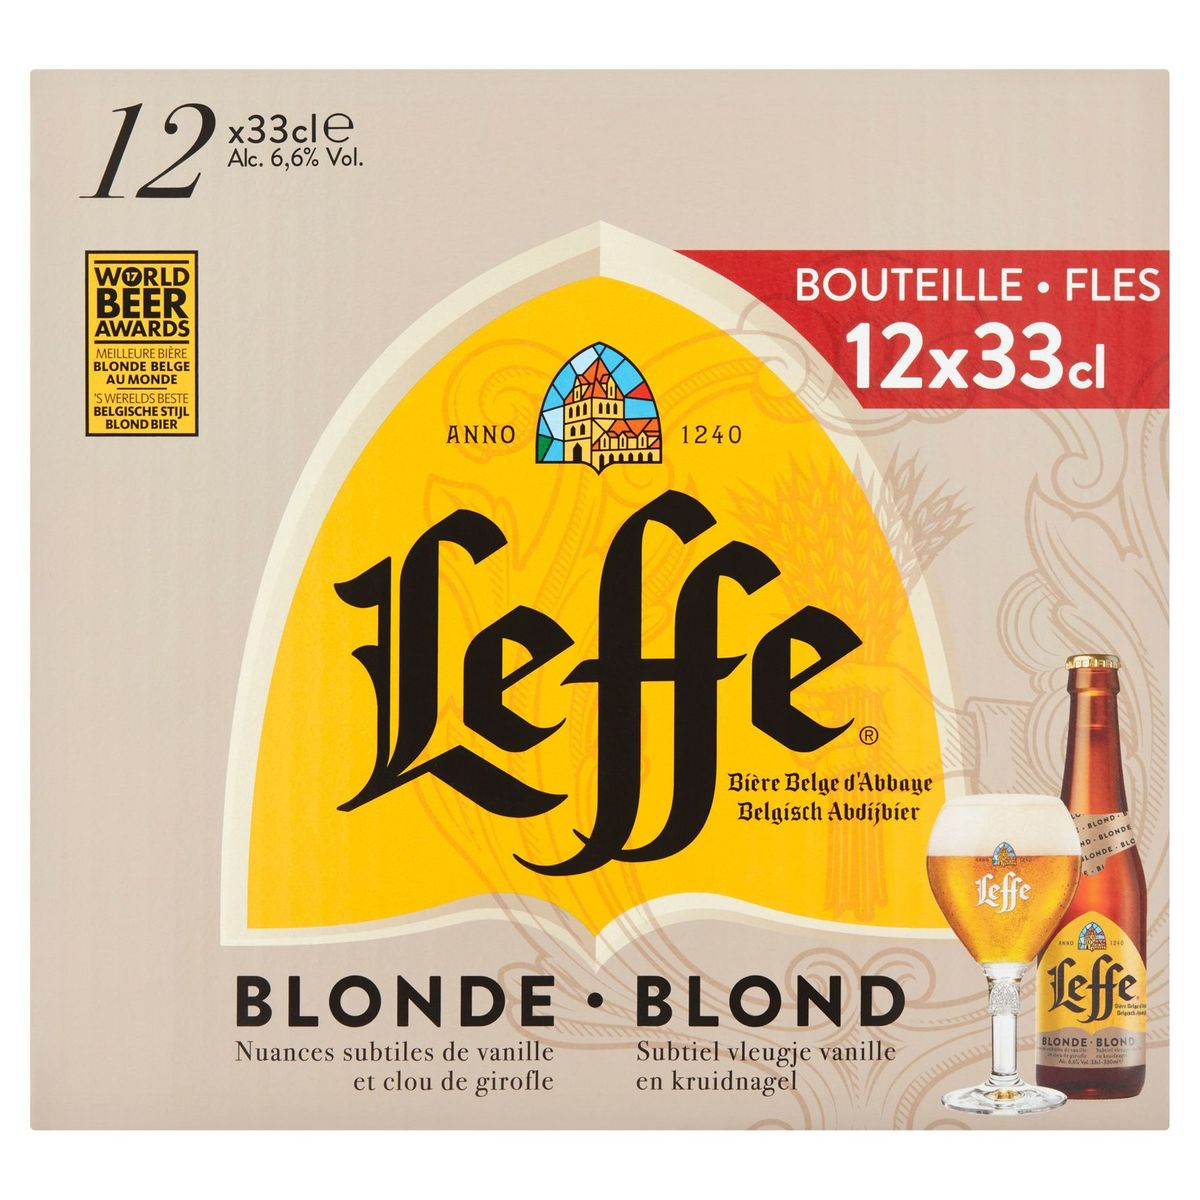 Leffe Belgisch Abdijbier Blond Flessen 12 x 33 cl